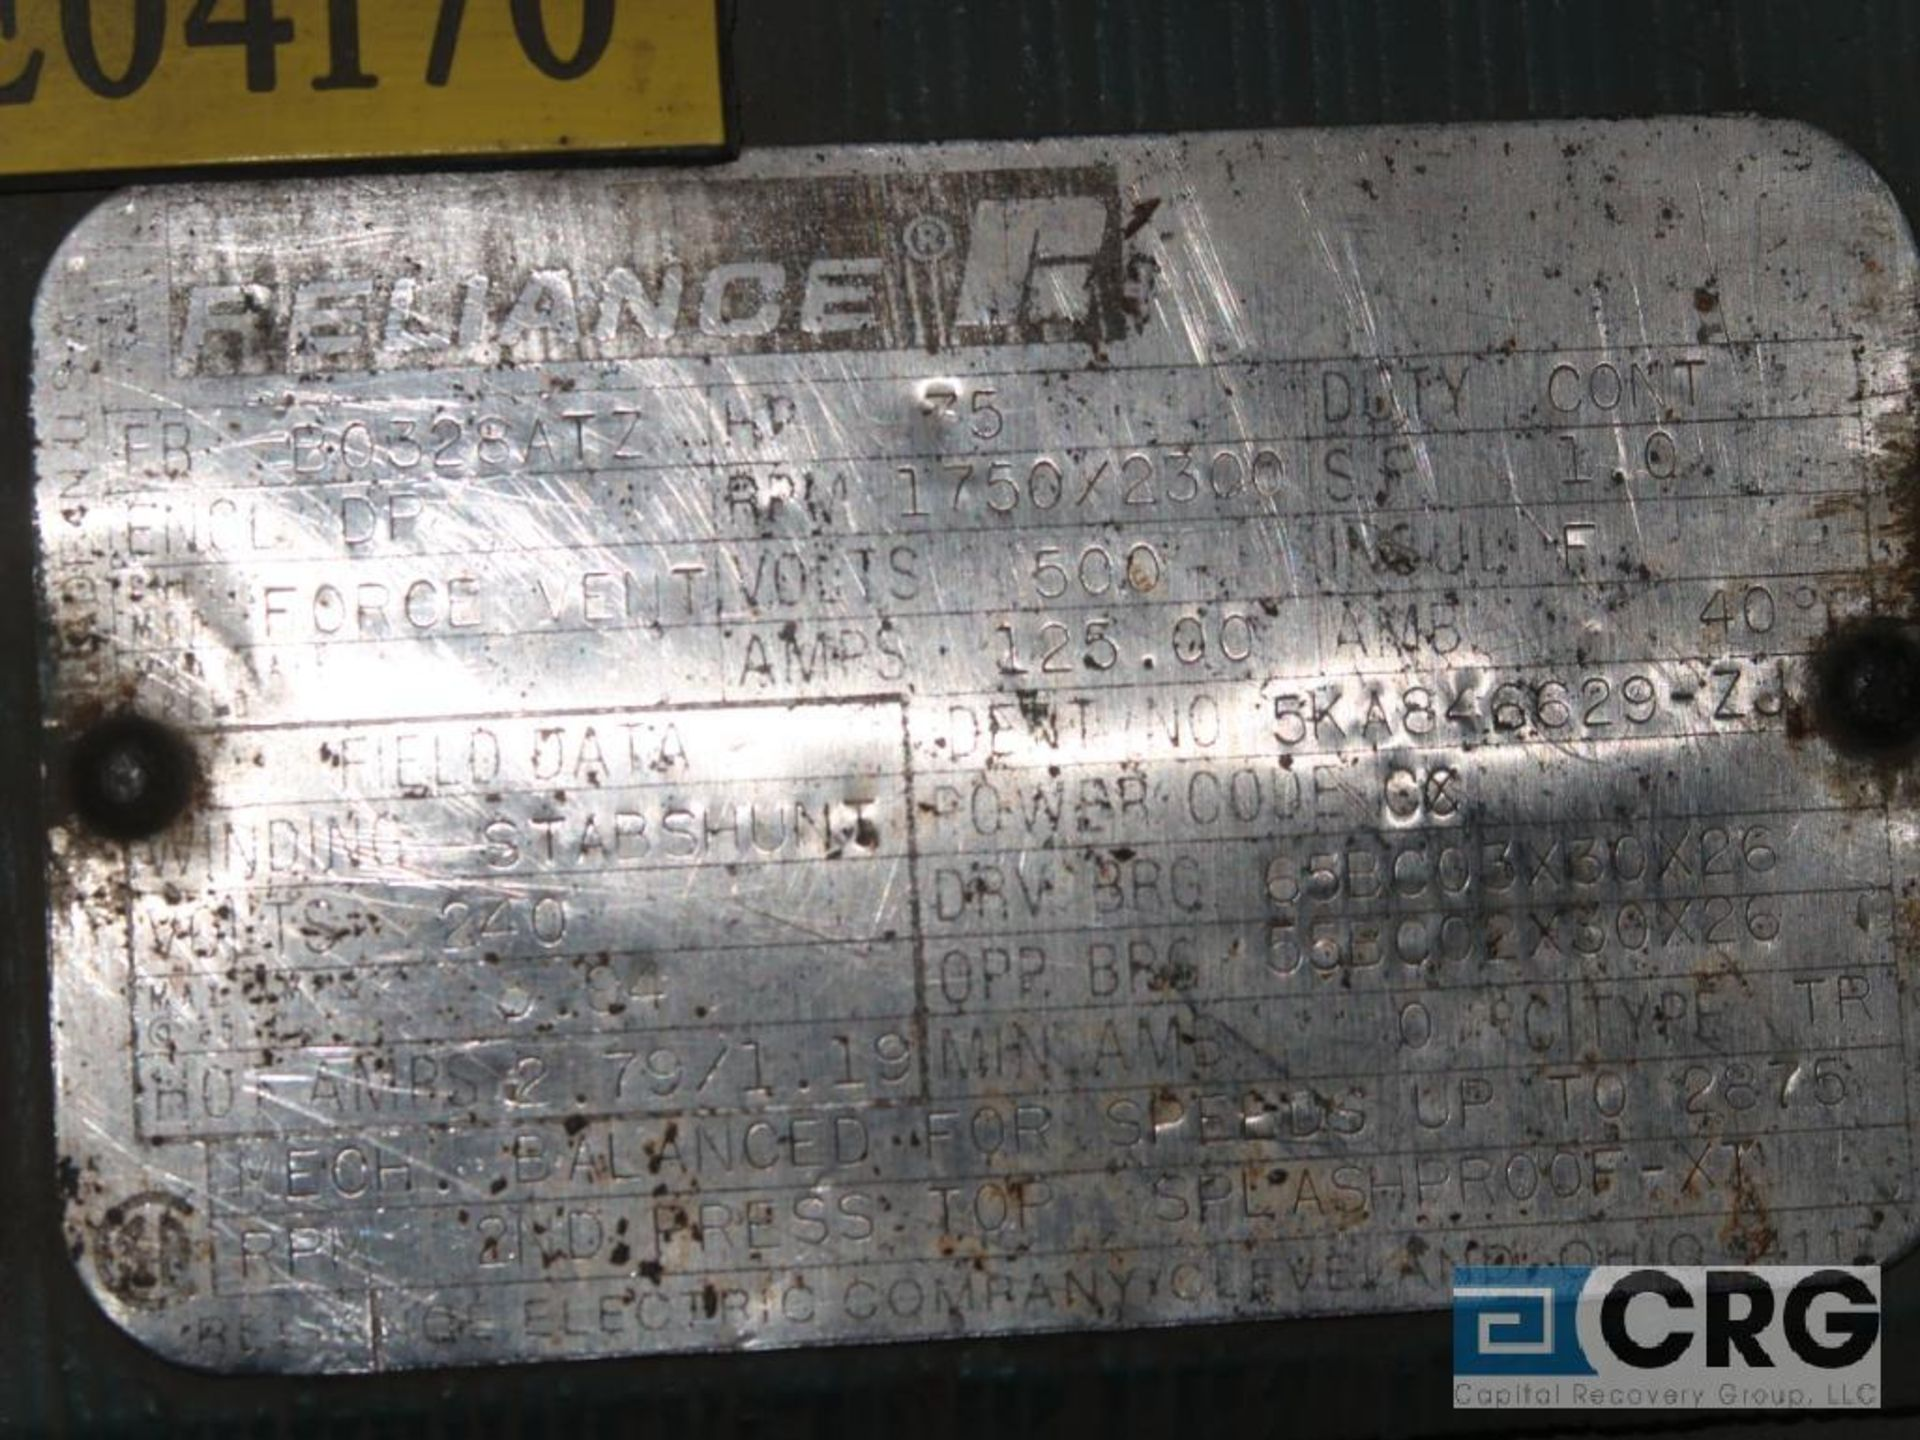 Reliance electric DC motor, 75 HP, 1,750/2,300 RPMs, 240 volt, 3 ph., B0328ATZ frame (Finish - Image 2 of 2